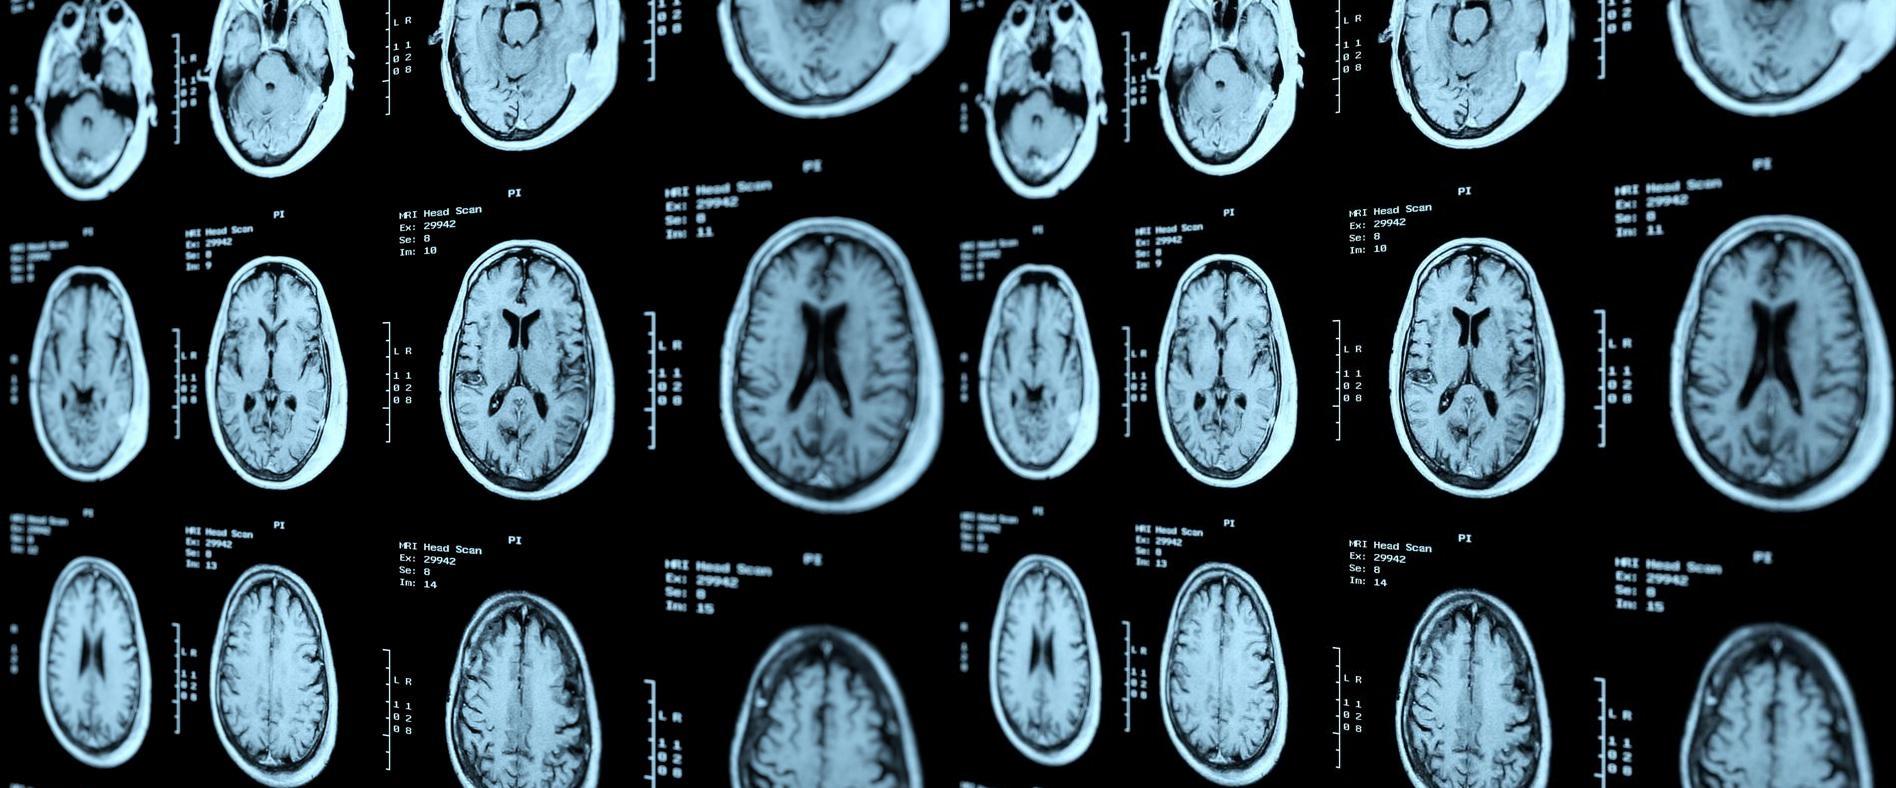 Using Machine Vision in Healthcare